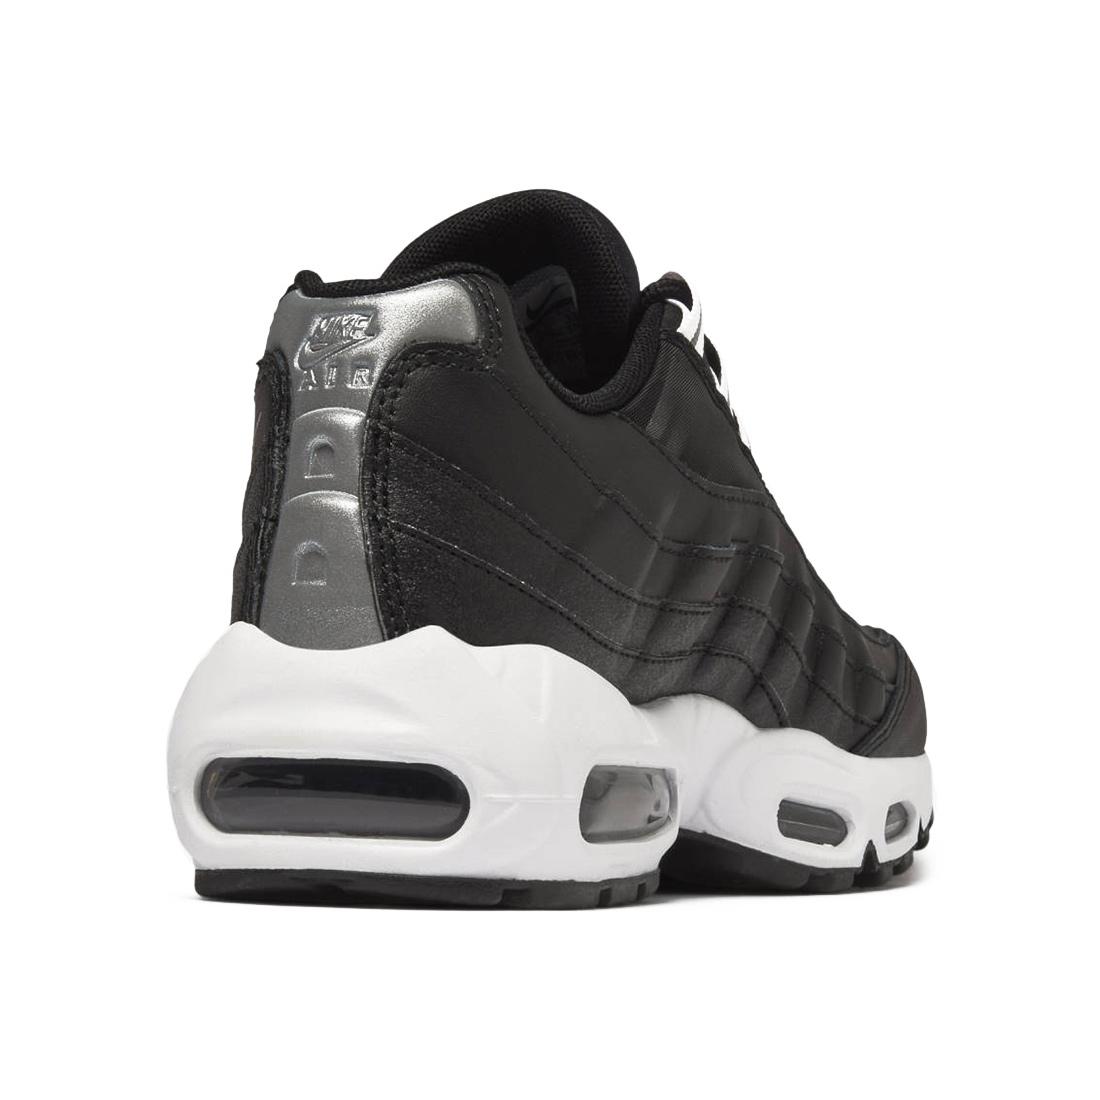 3c573e9906c4d8 Nike WMNS Air Max 95 Damen Sneaker schwarz weiß 307960 020 – Bild 3